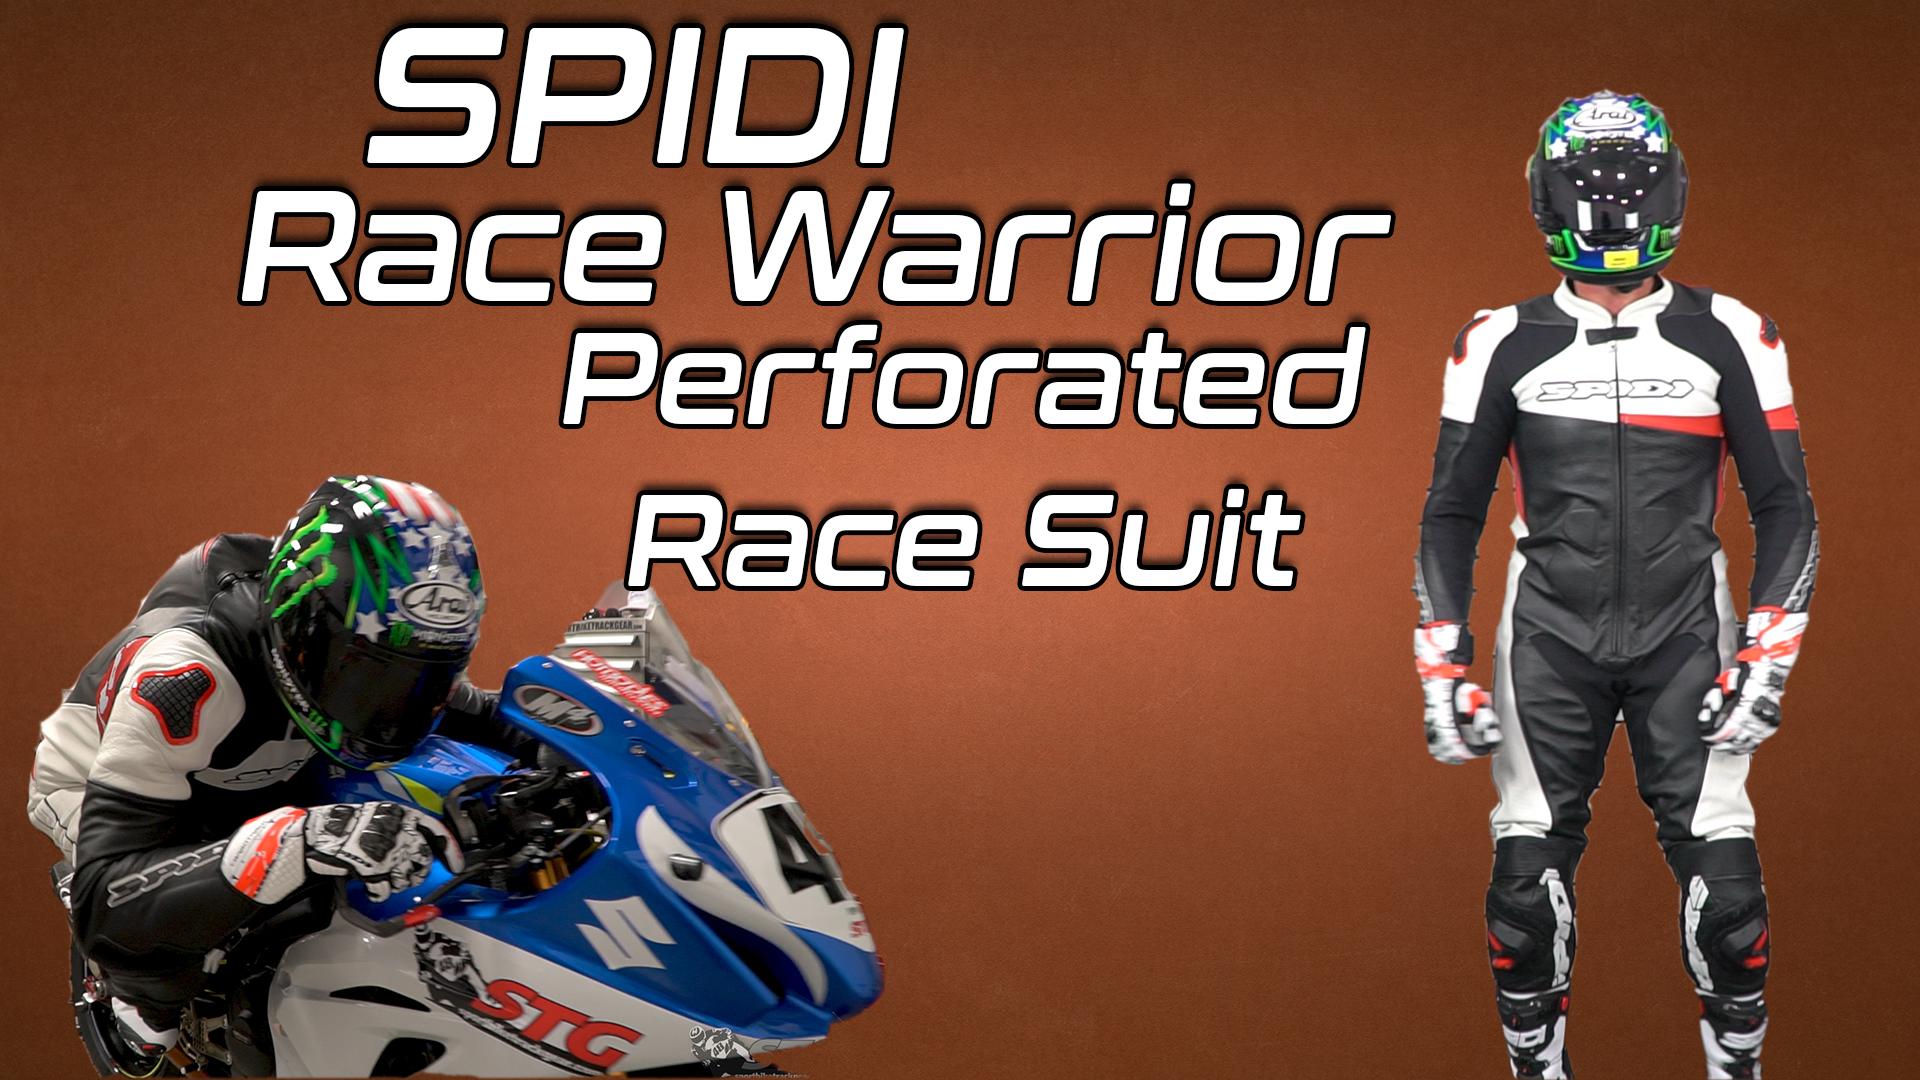 Spidi Race Warrior Perforated Race Suit